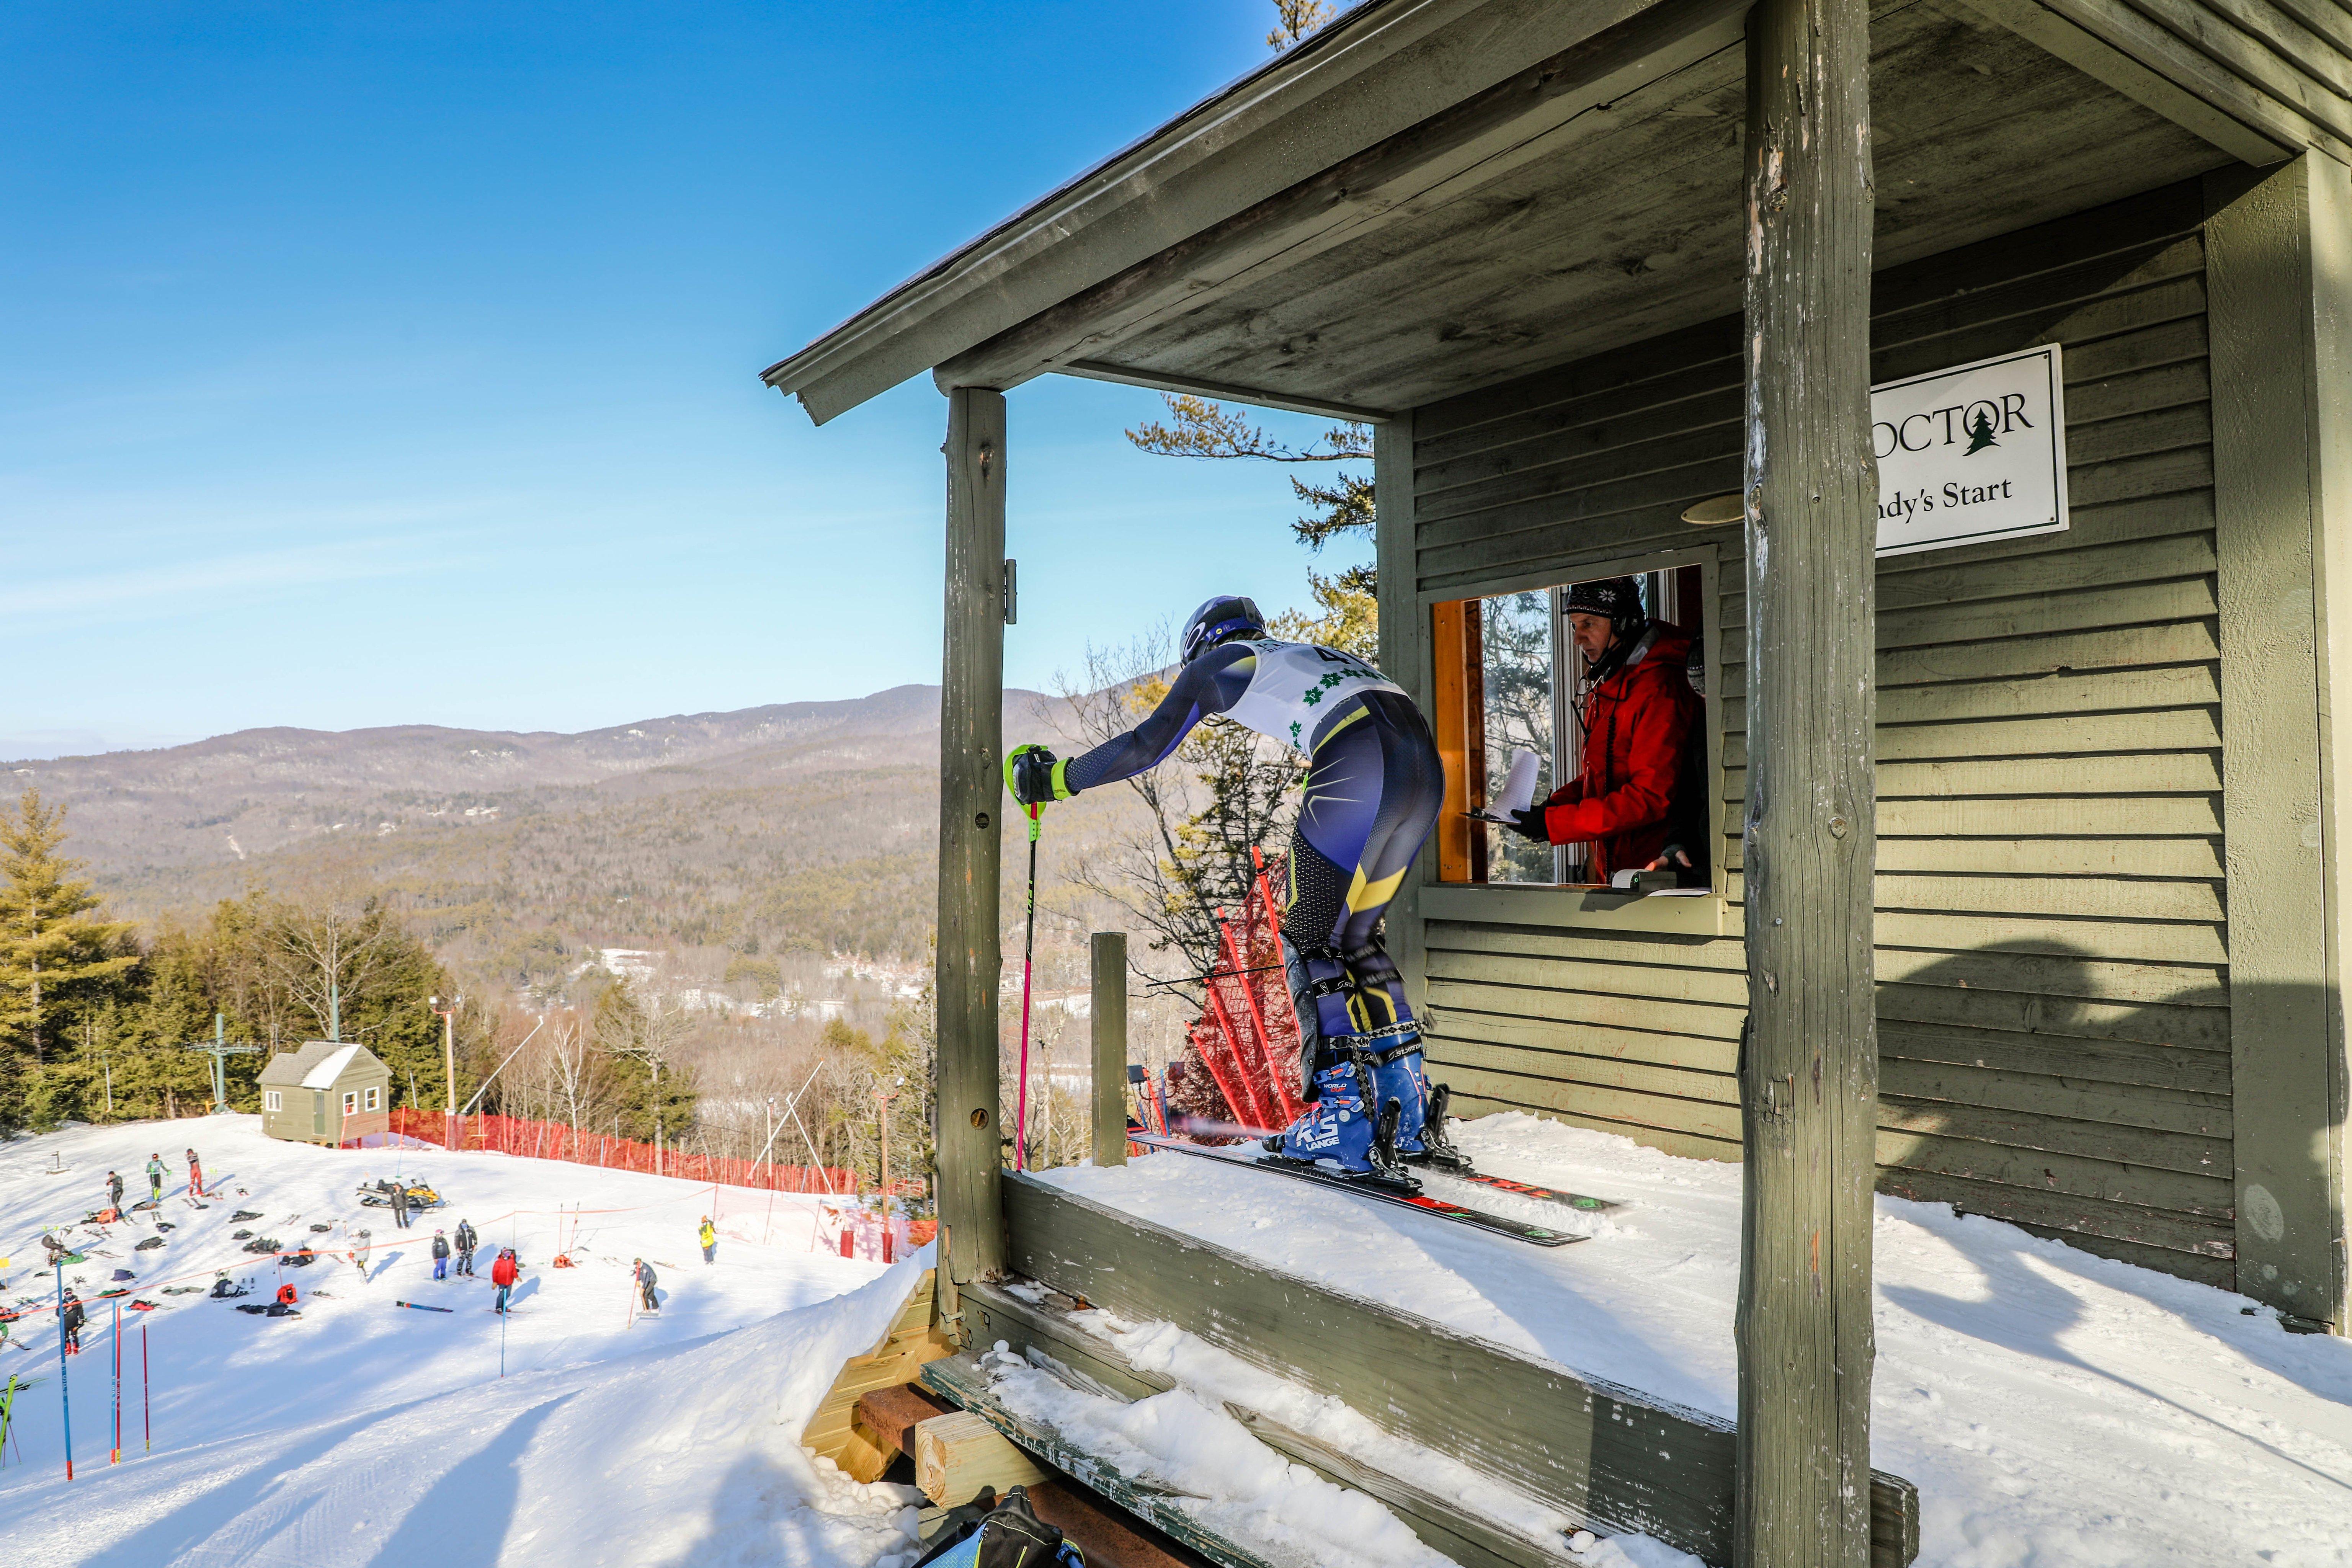 Proctor Academy Skiing Boarding School